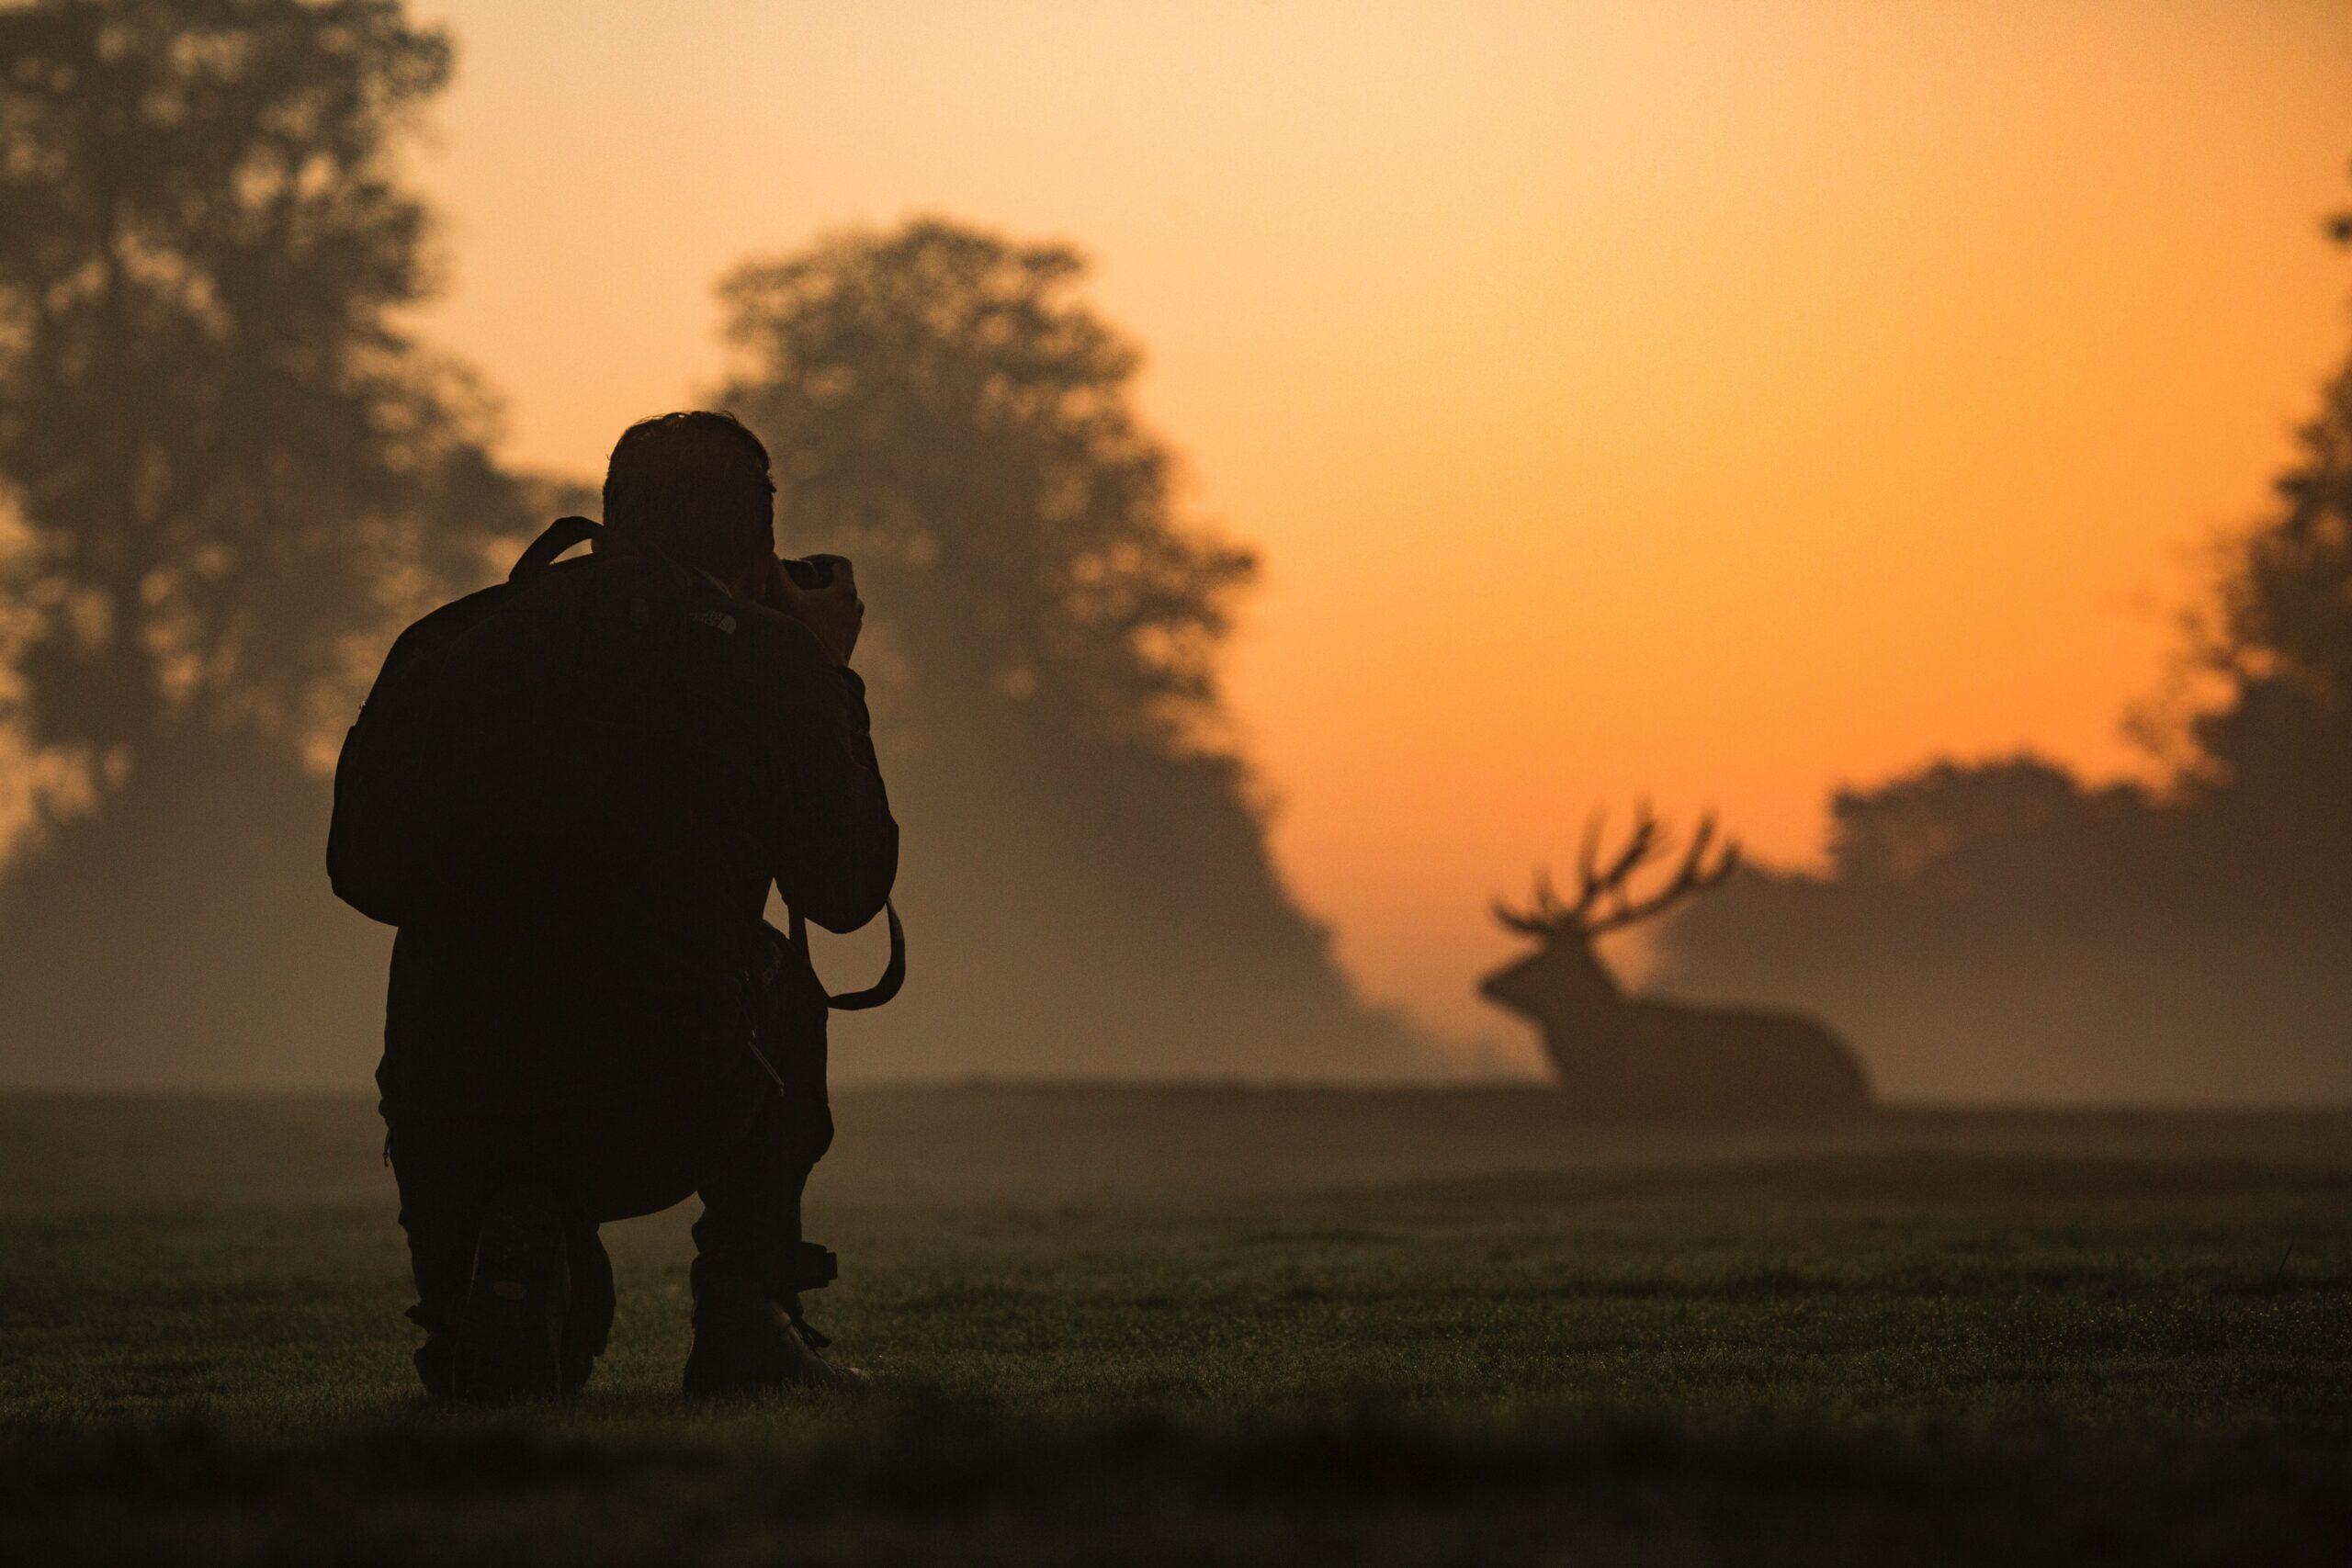 Photographer using Wildlife photography equipment